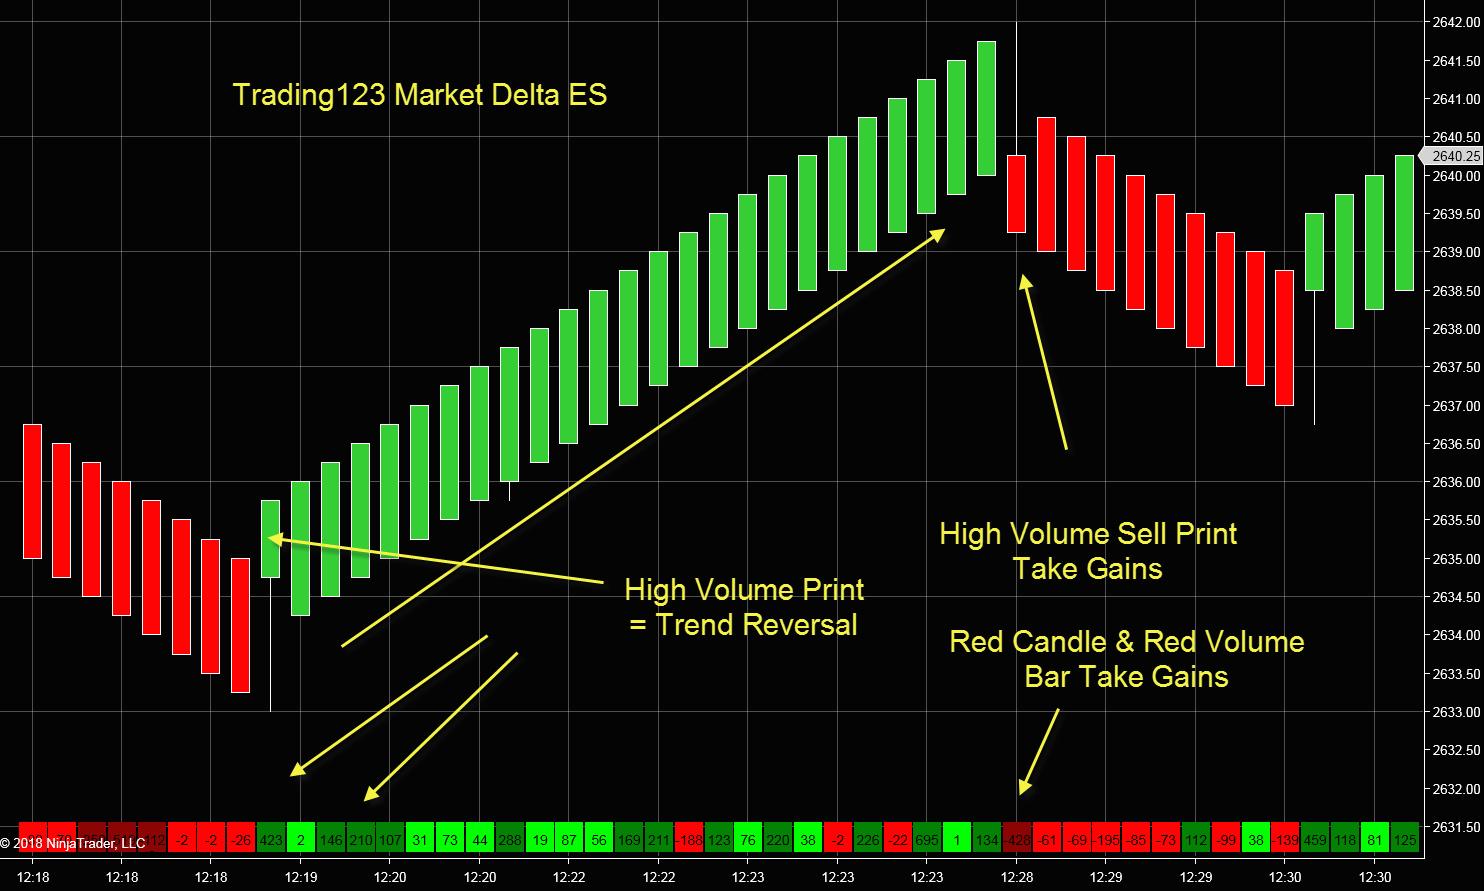 Market Delta Indicator Follow The Institutional Order Flow Trading123 Delta Marketing Volume